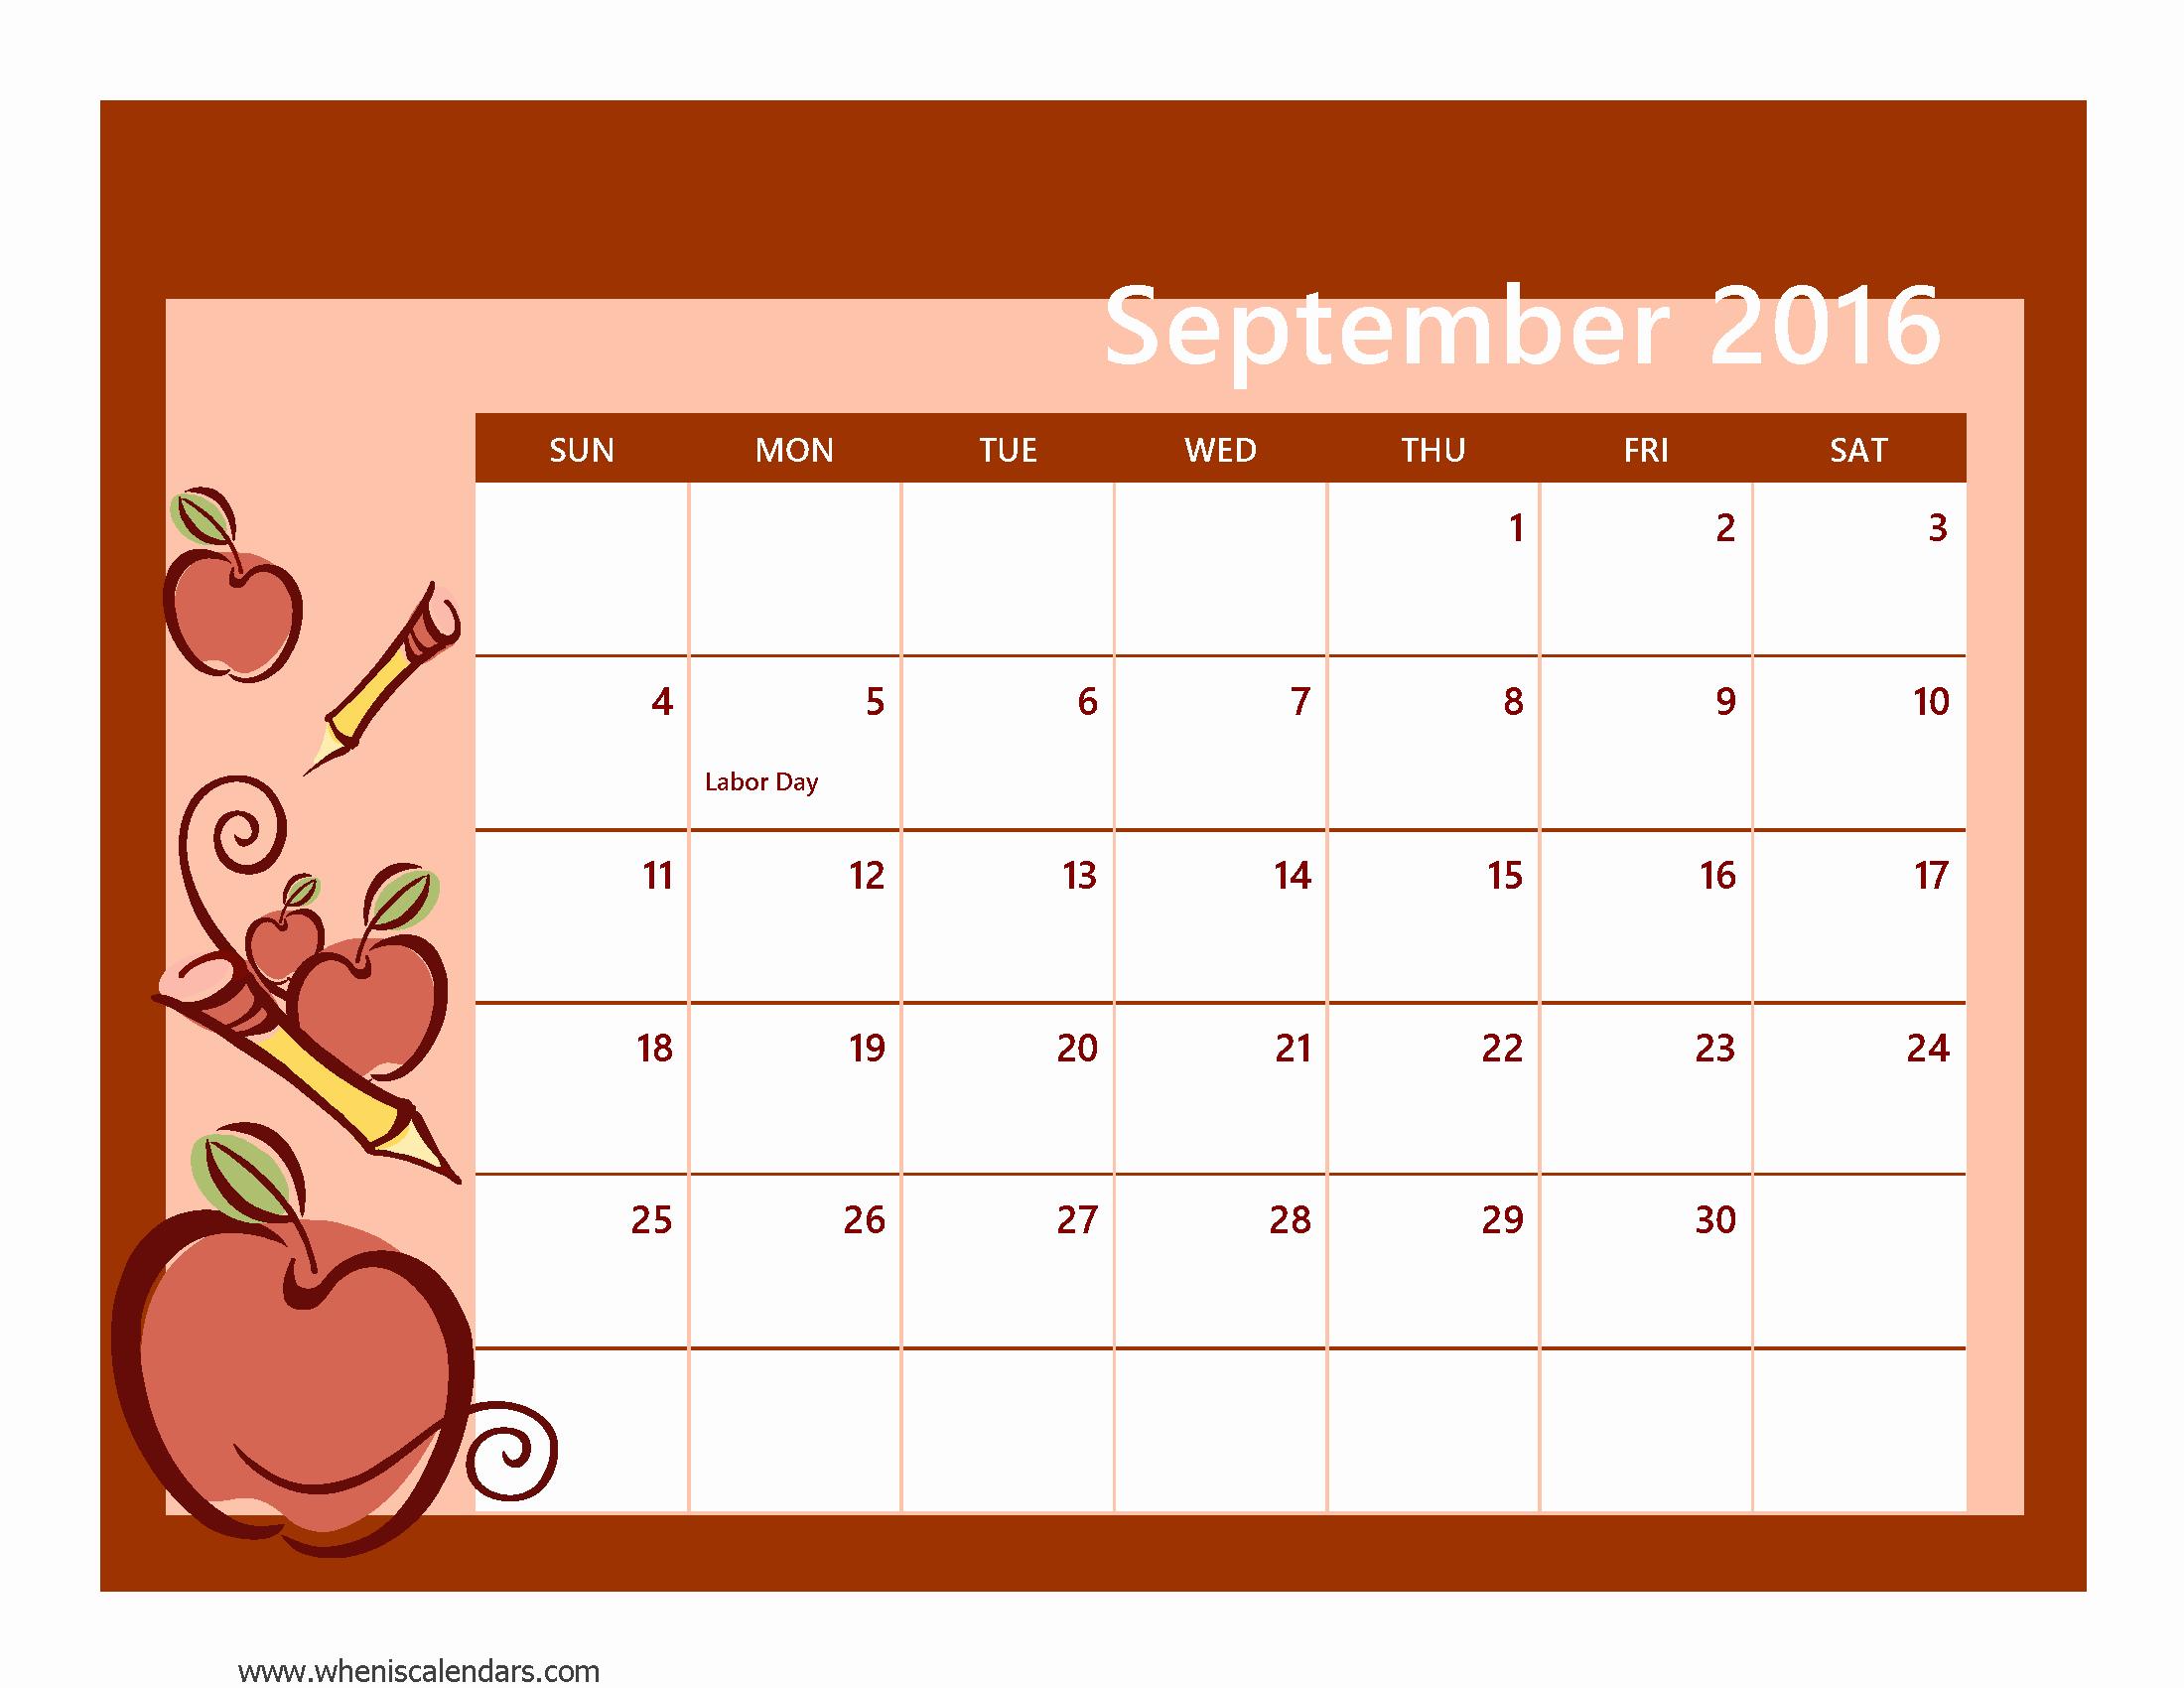 Calendar 2016 Printable with Holidays New September 2016 Calendar Printable Pdf